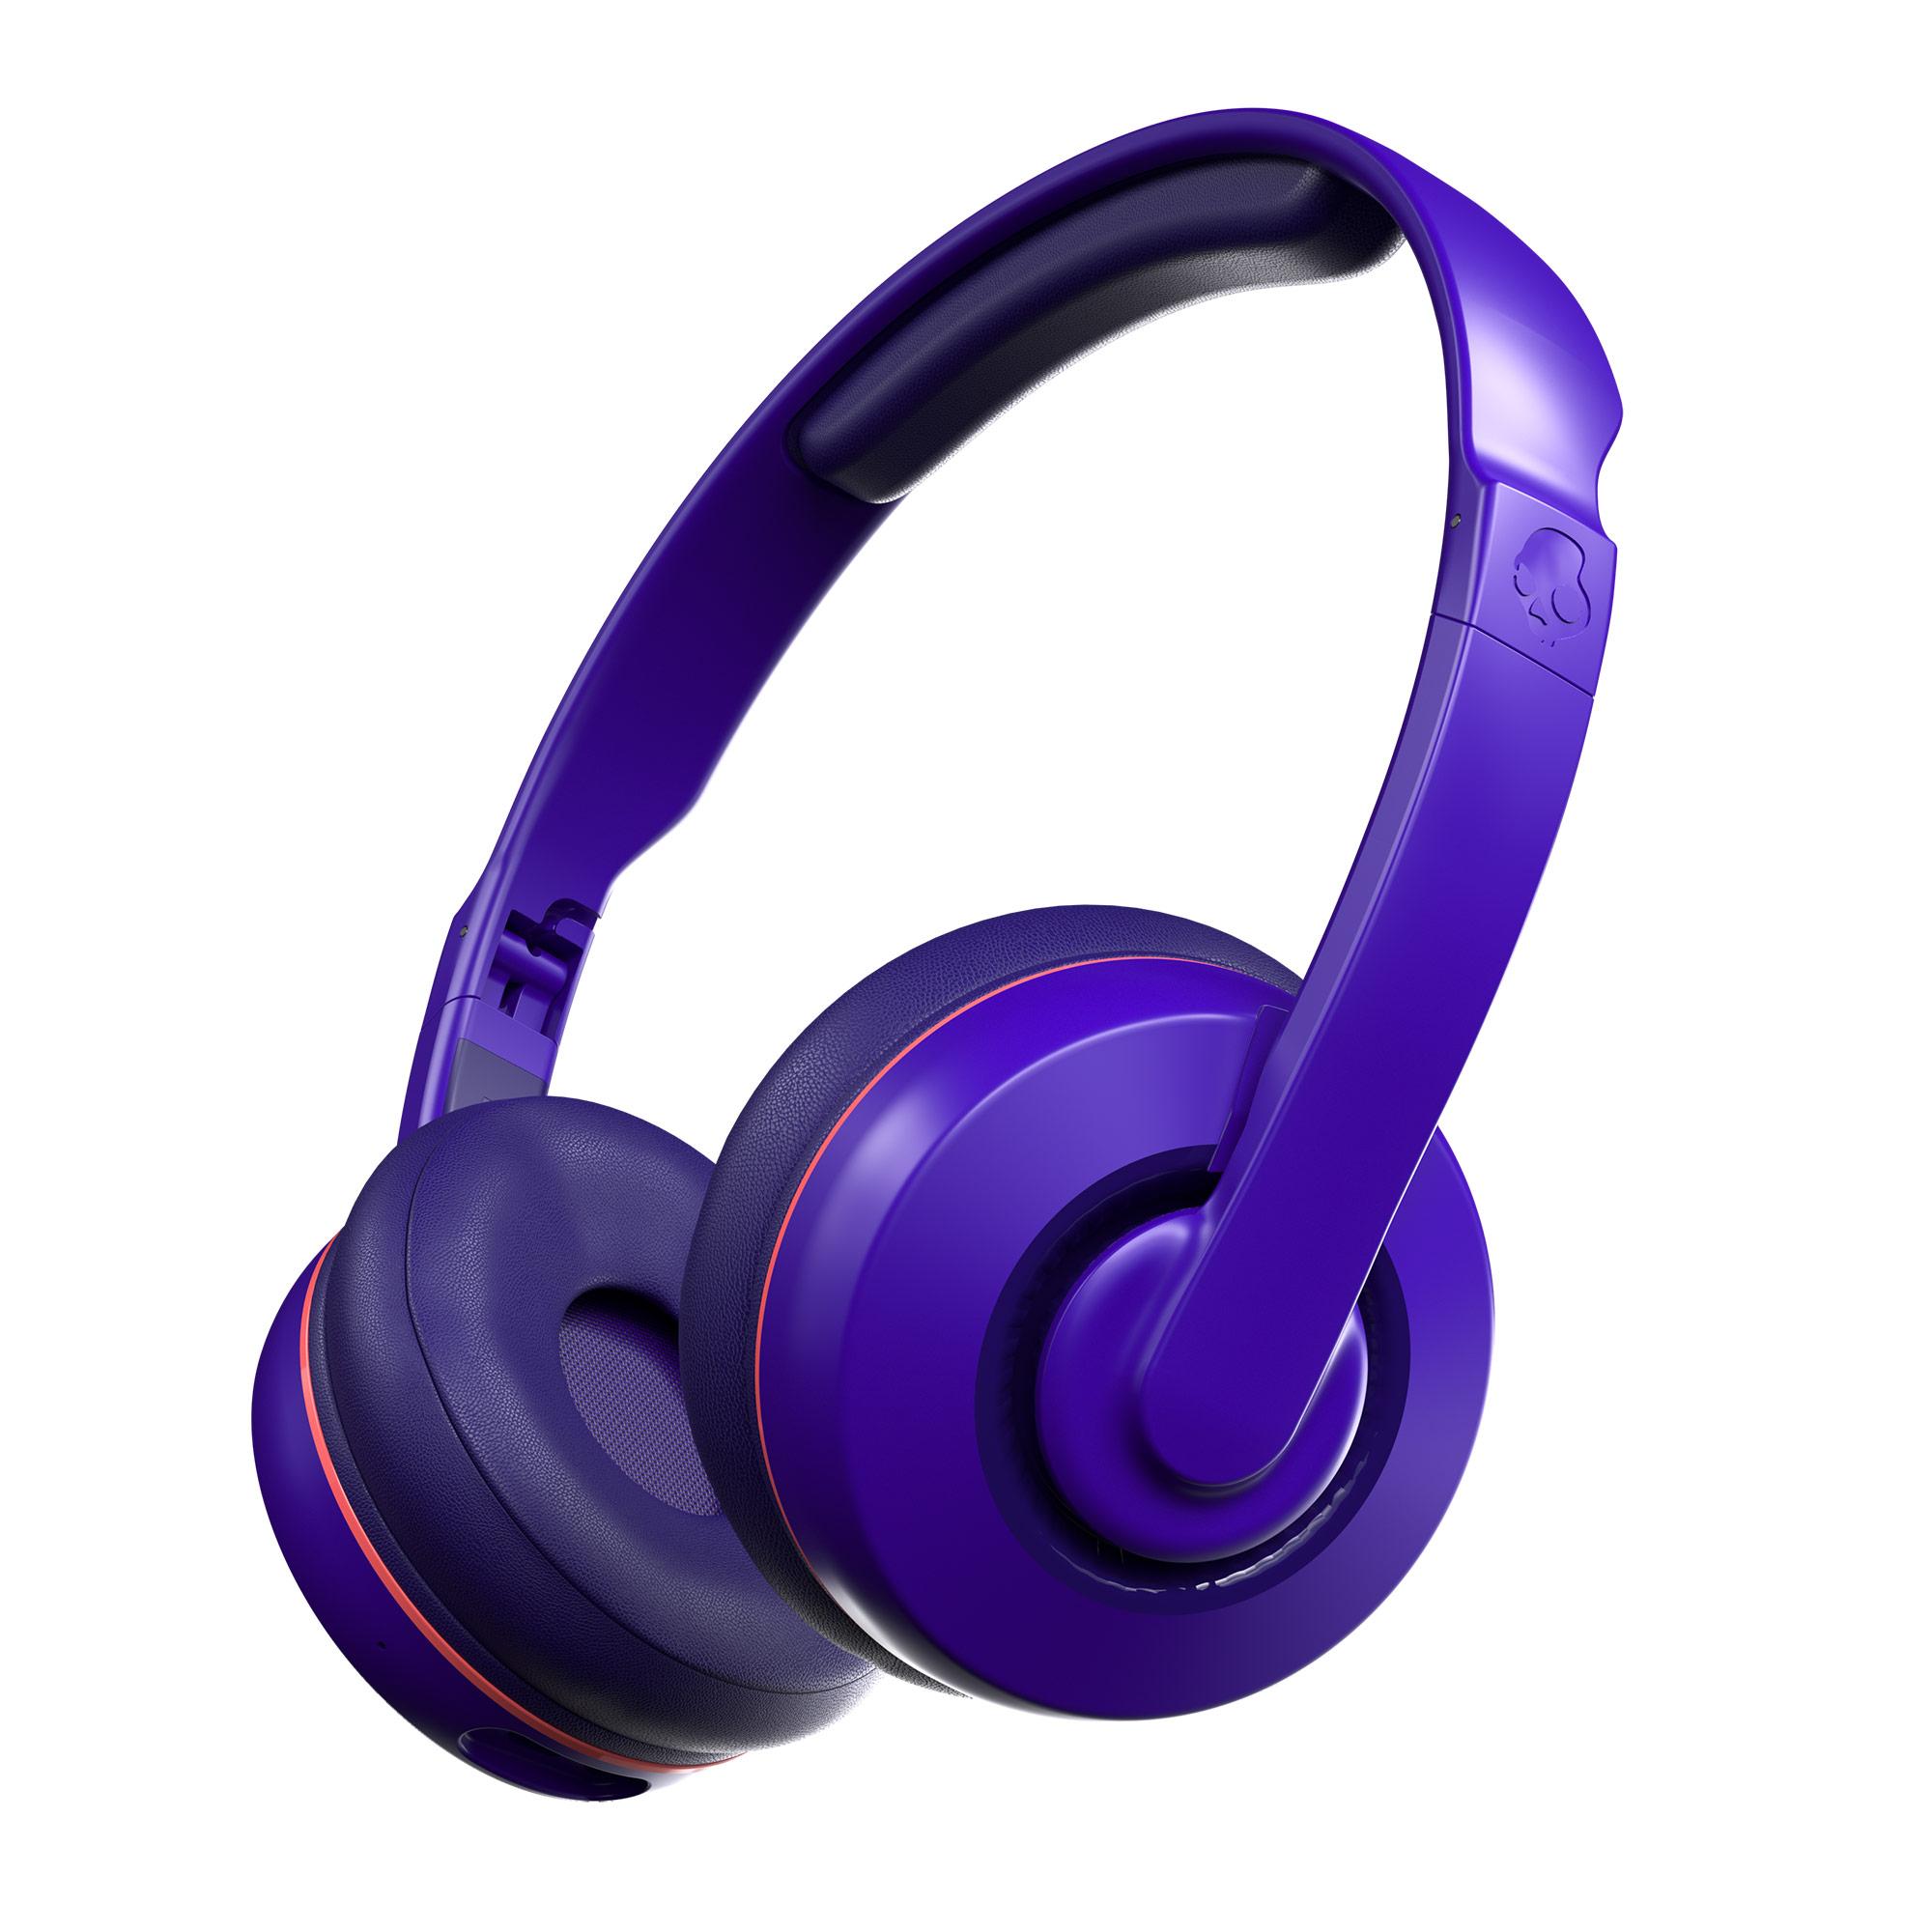 Skullcandy Cassette Wireless On-Ear Headphone – Retro Purple for $29